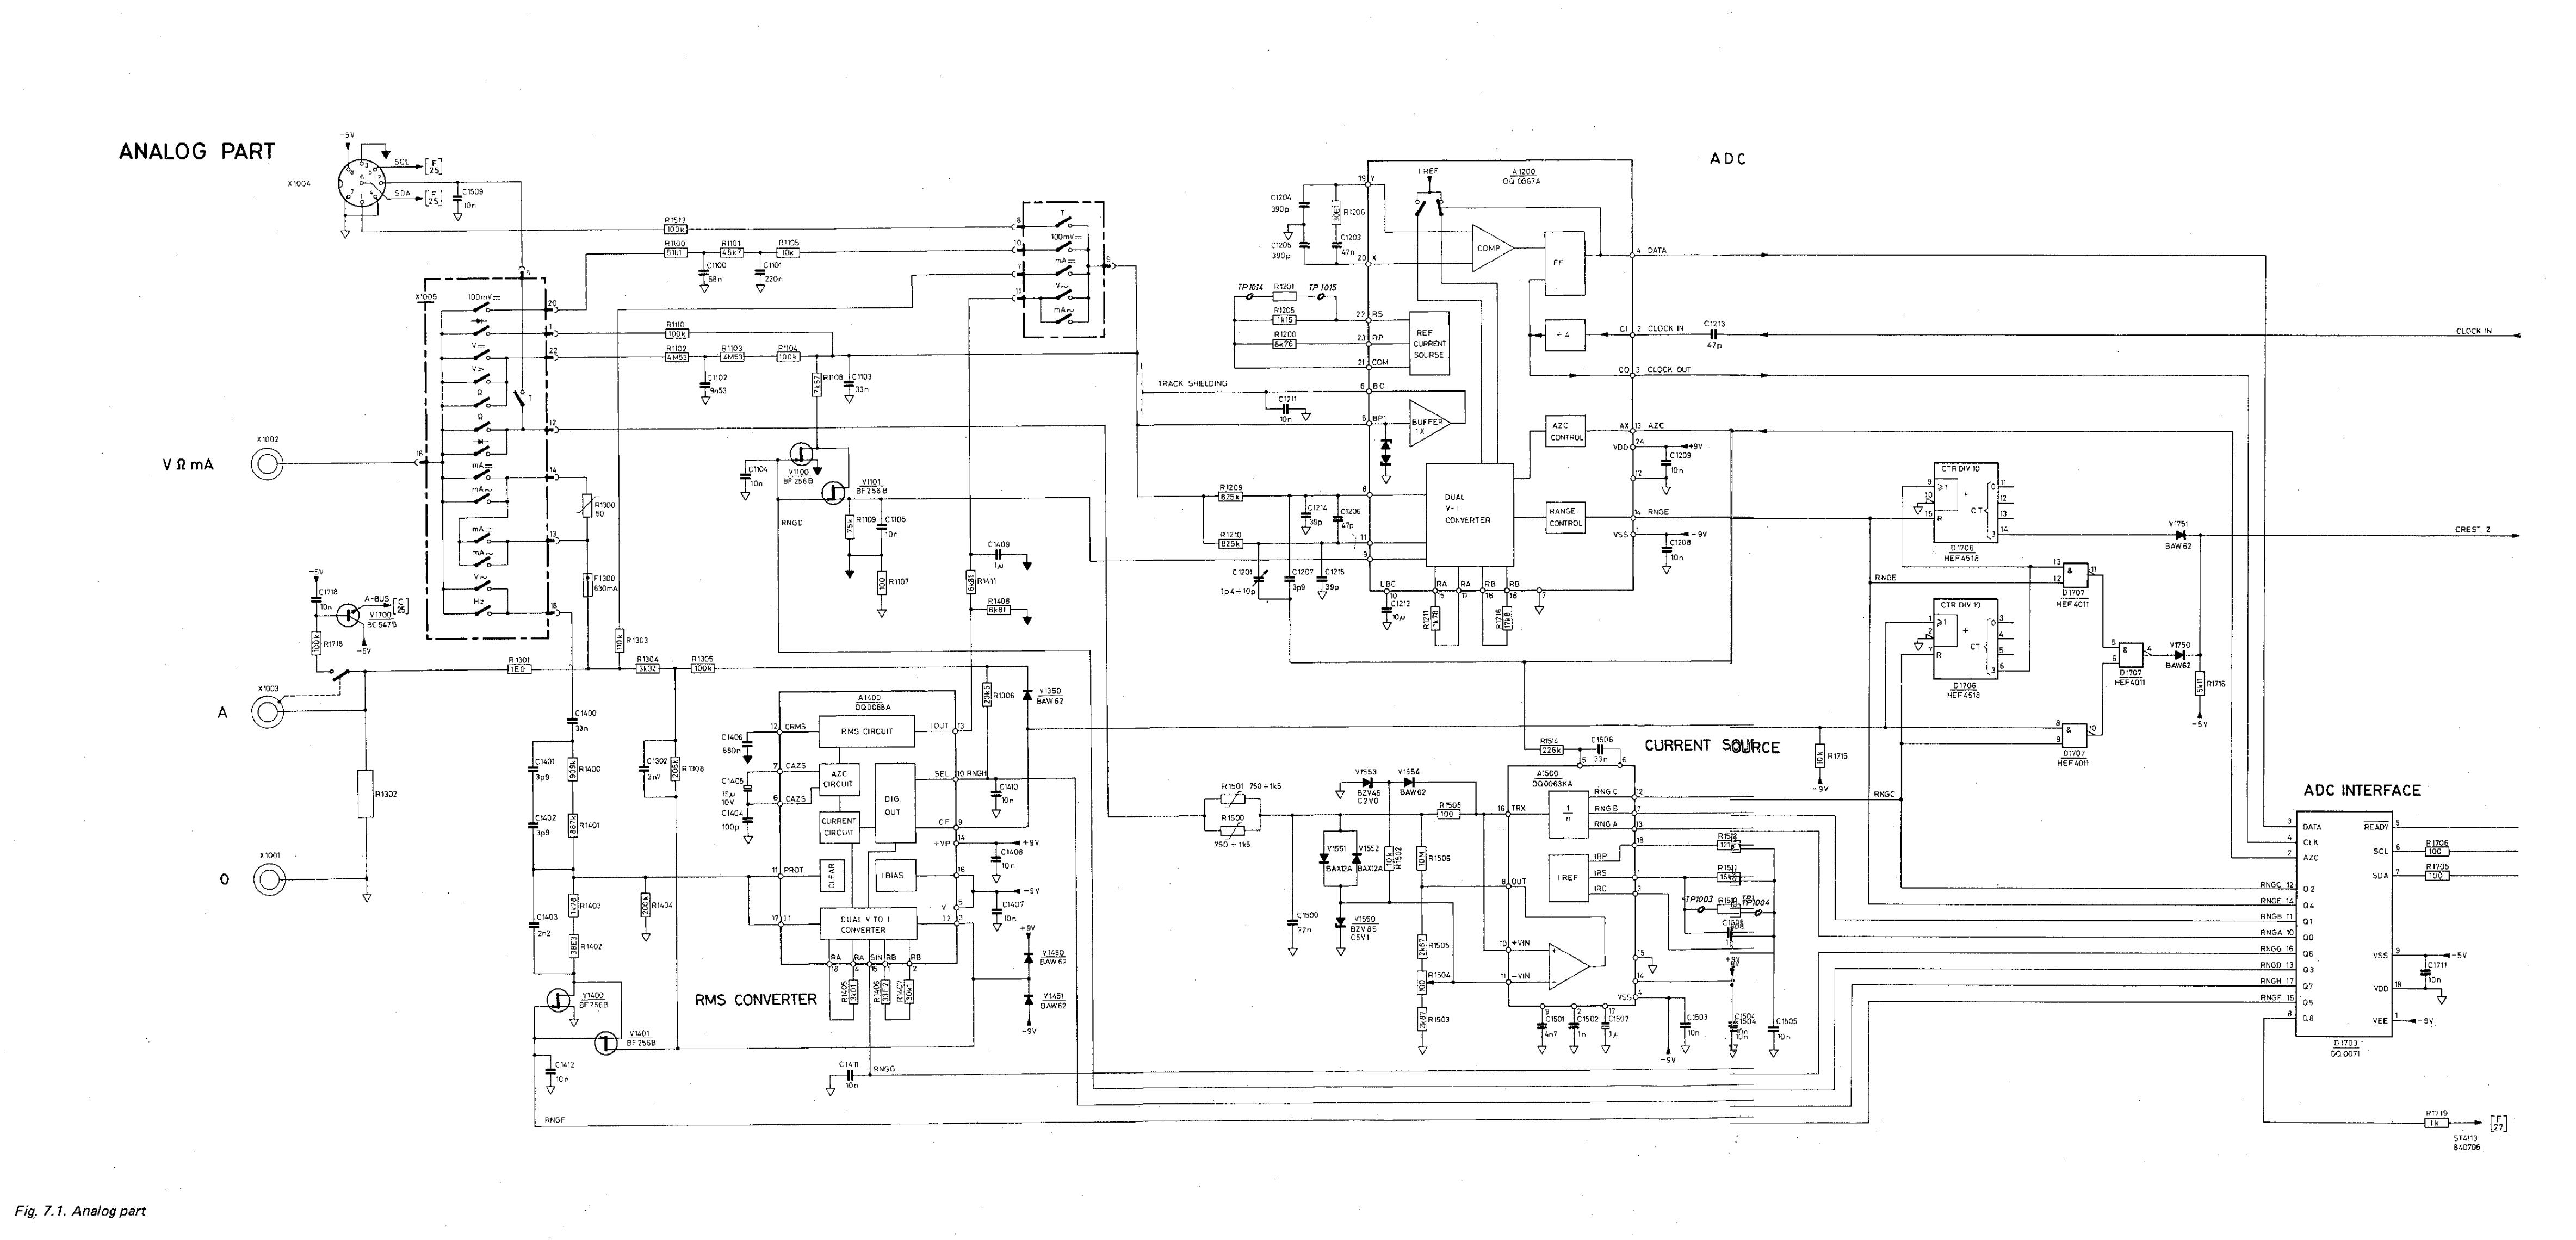 Beste 2012 Ford 7 Wege Schaltplan Ideen - Elektrische Schaltplan ...